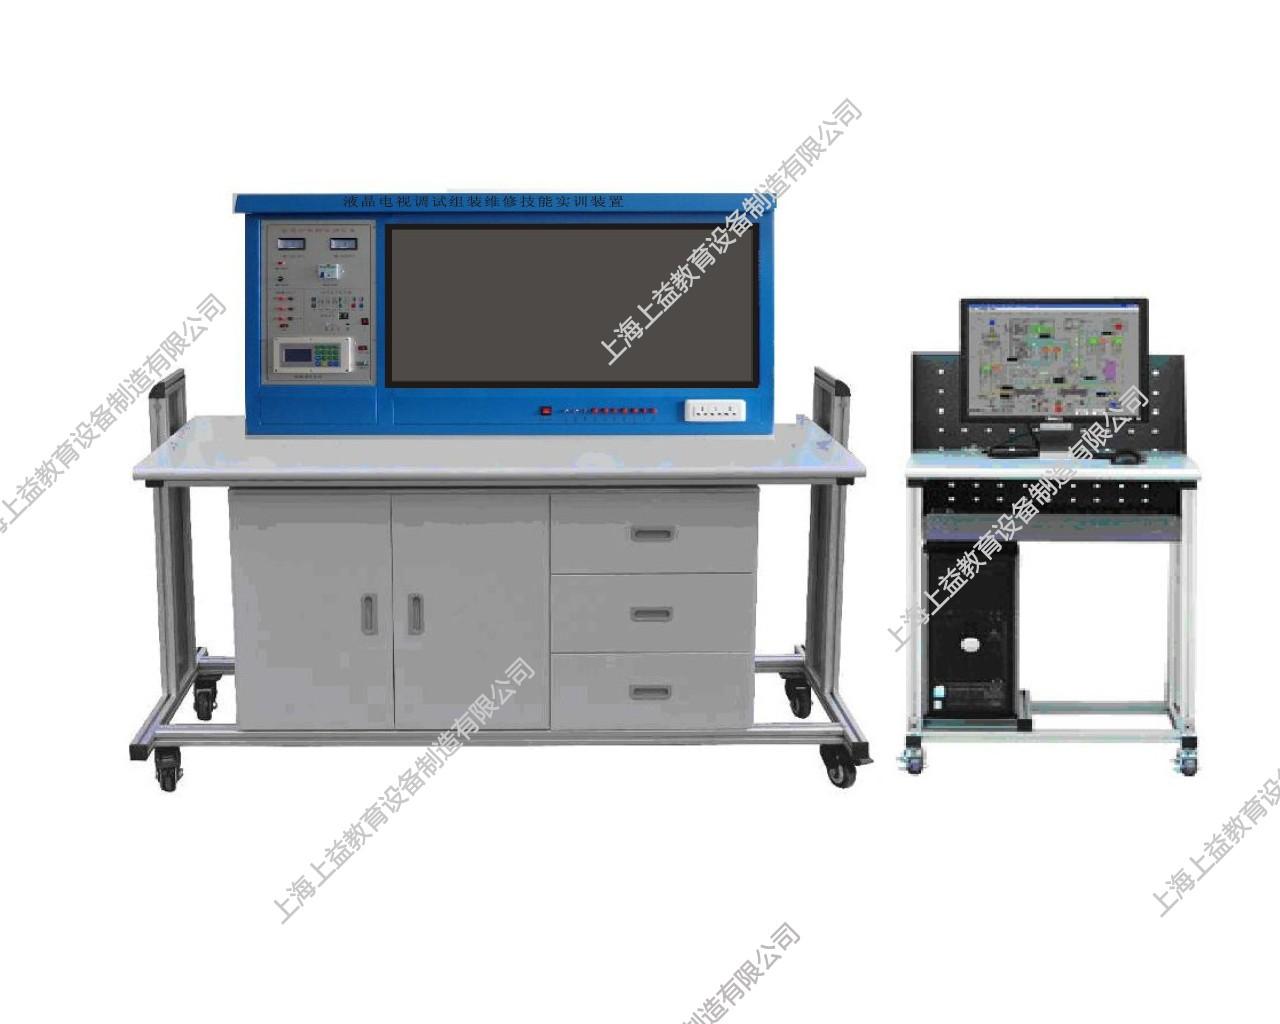 SYJYD-606型 家电音视频维修技能wwwlehu8viplehu68vip装置(智能lehu68vip型、32寸液晶)